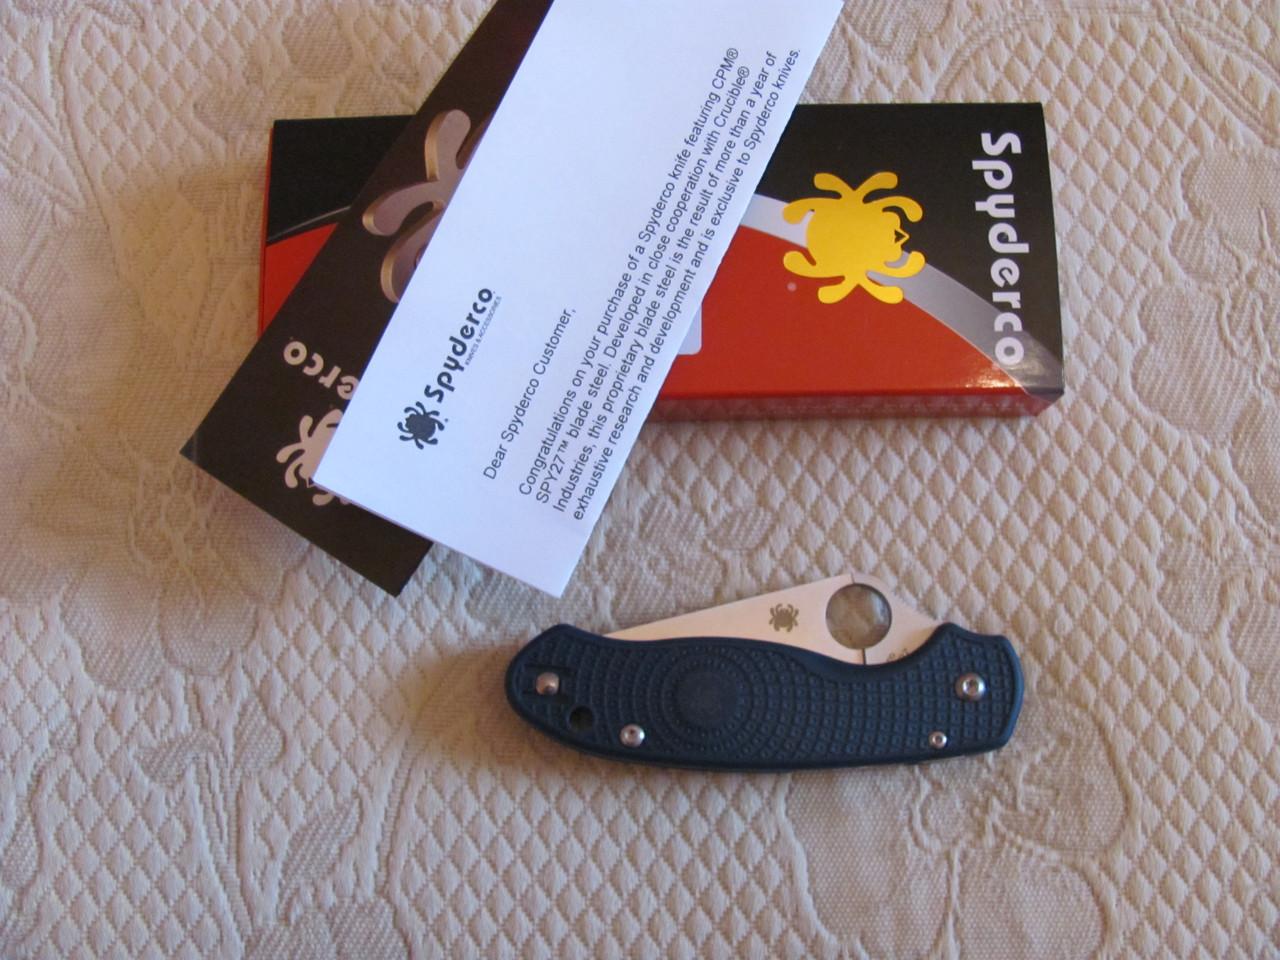 Нож Spyderco Para 3 Lightweight  сталь CPM SPY27  C223PCBL